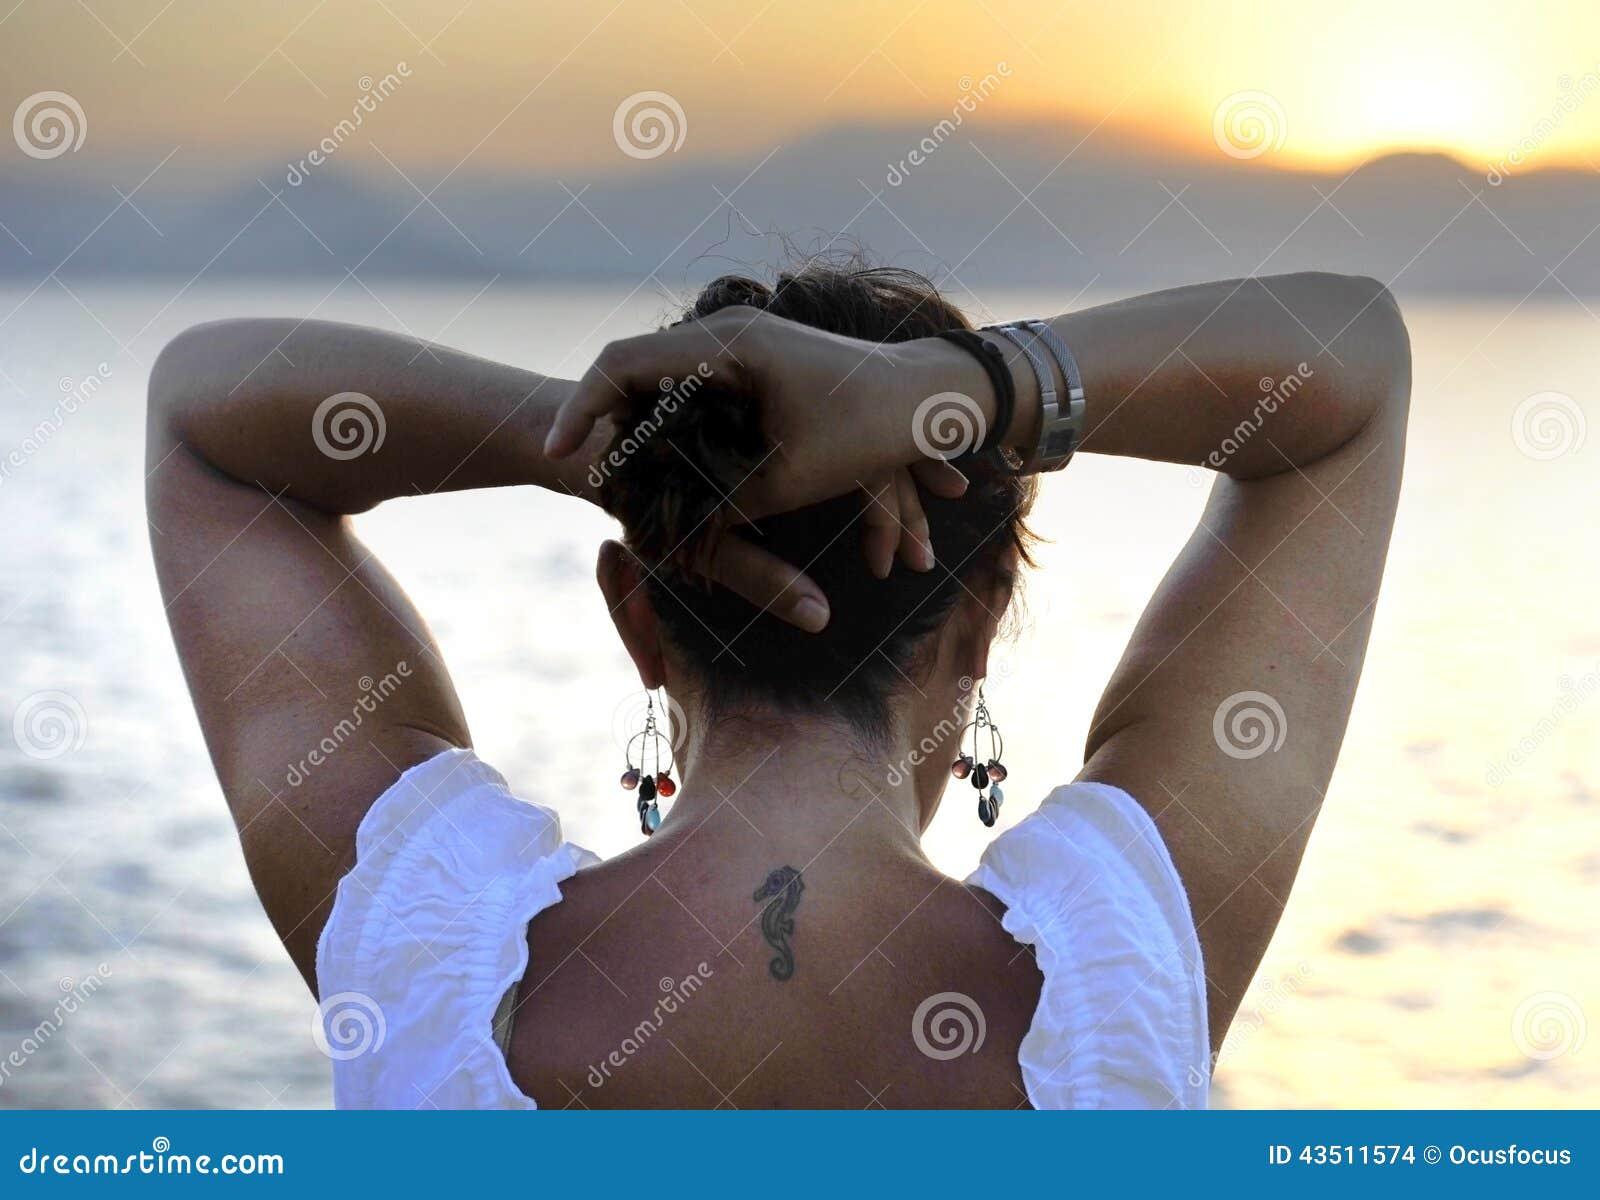 femme avec le tatouage arri re d 39 hippocampe se tenant seul regardant l 39 horizon de mer photo. Black Bedroom Furniture Sets. Home Design Ideas